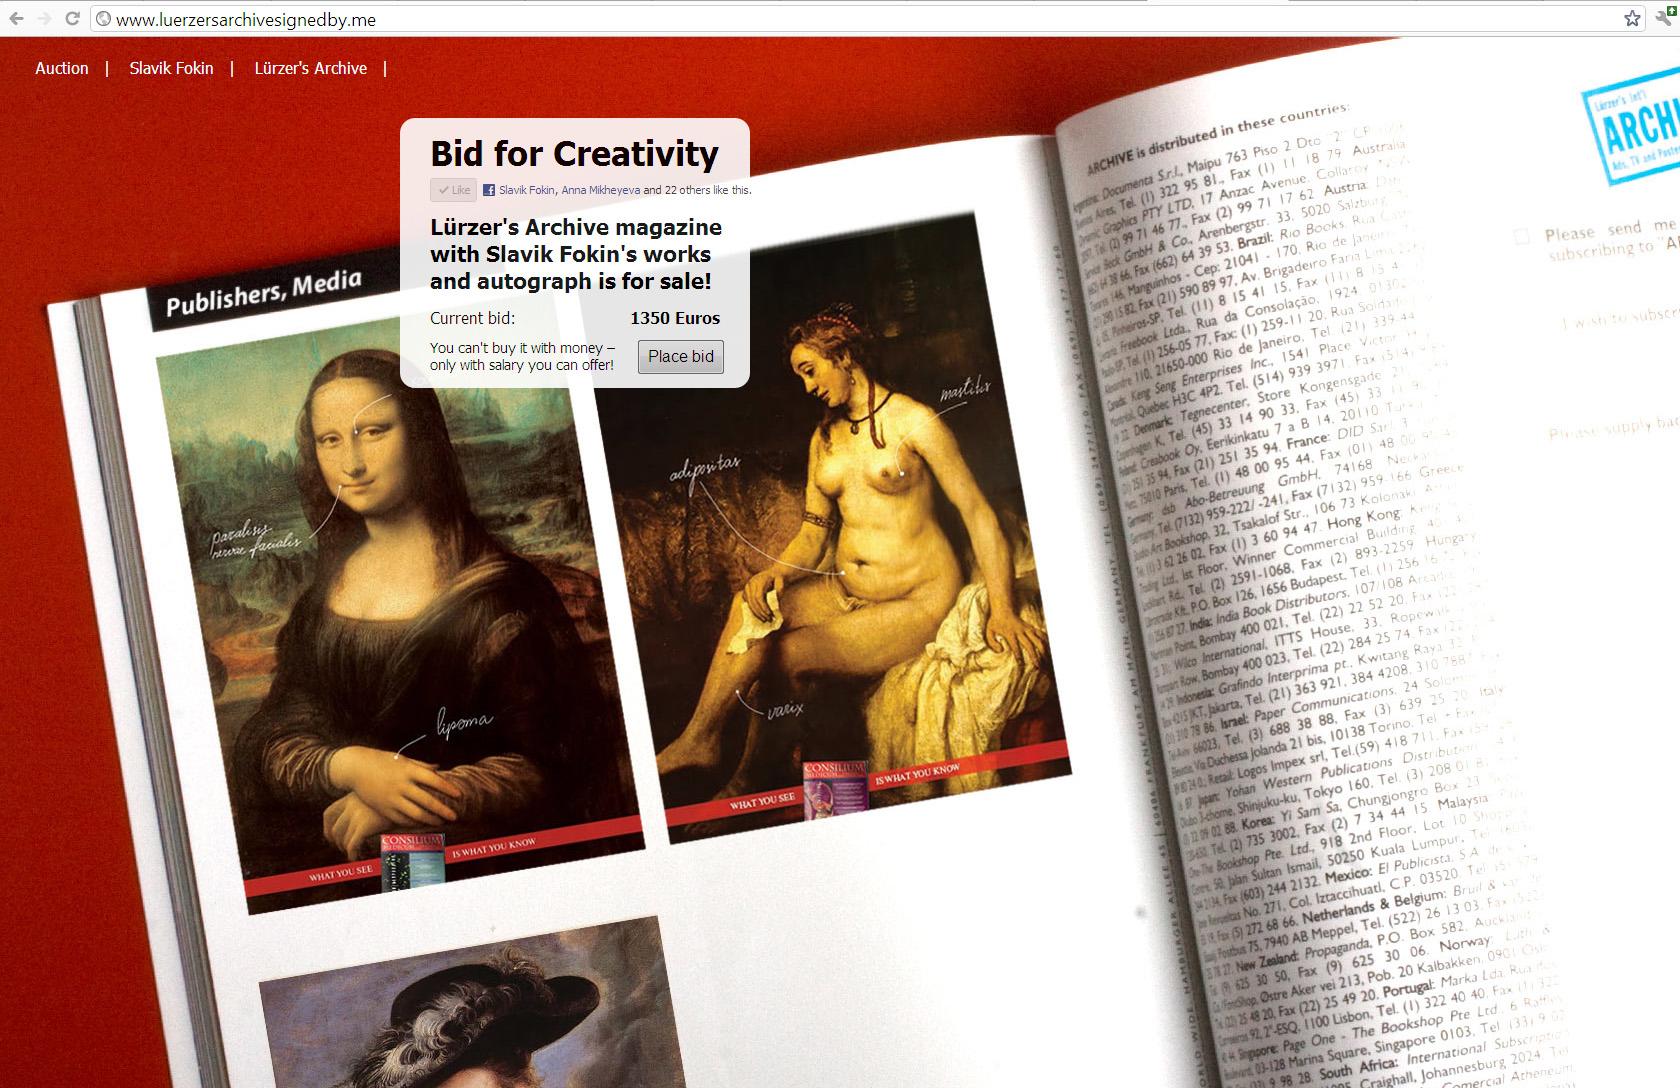 Bid for Creativity. Lürzer's Archive signed by Slavik Fokin